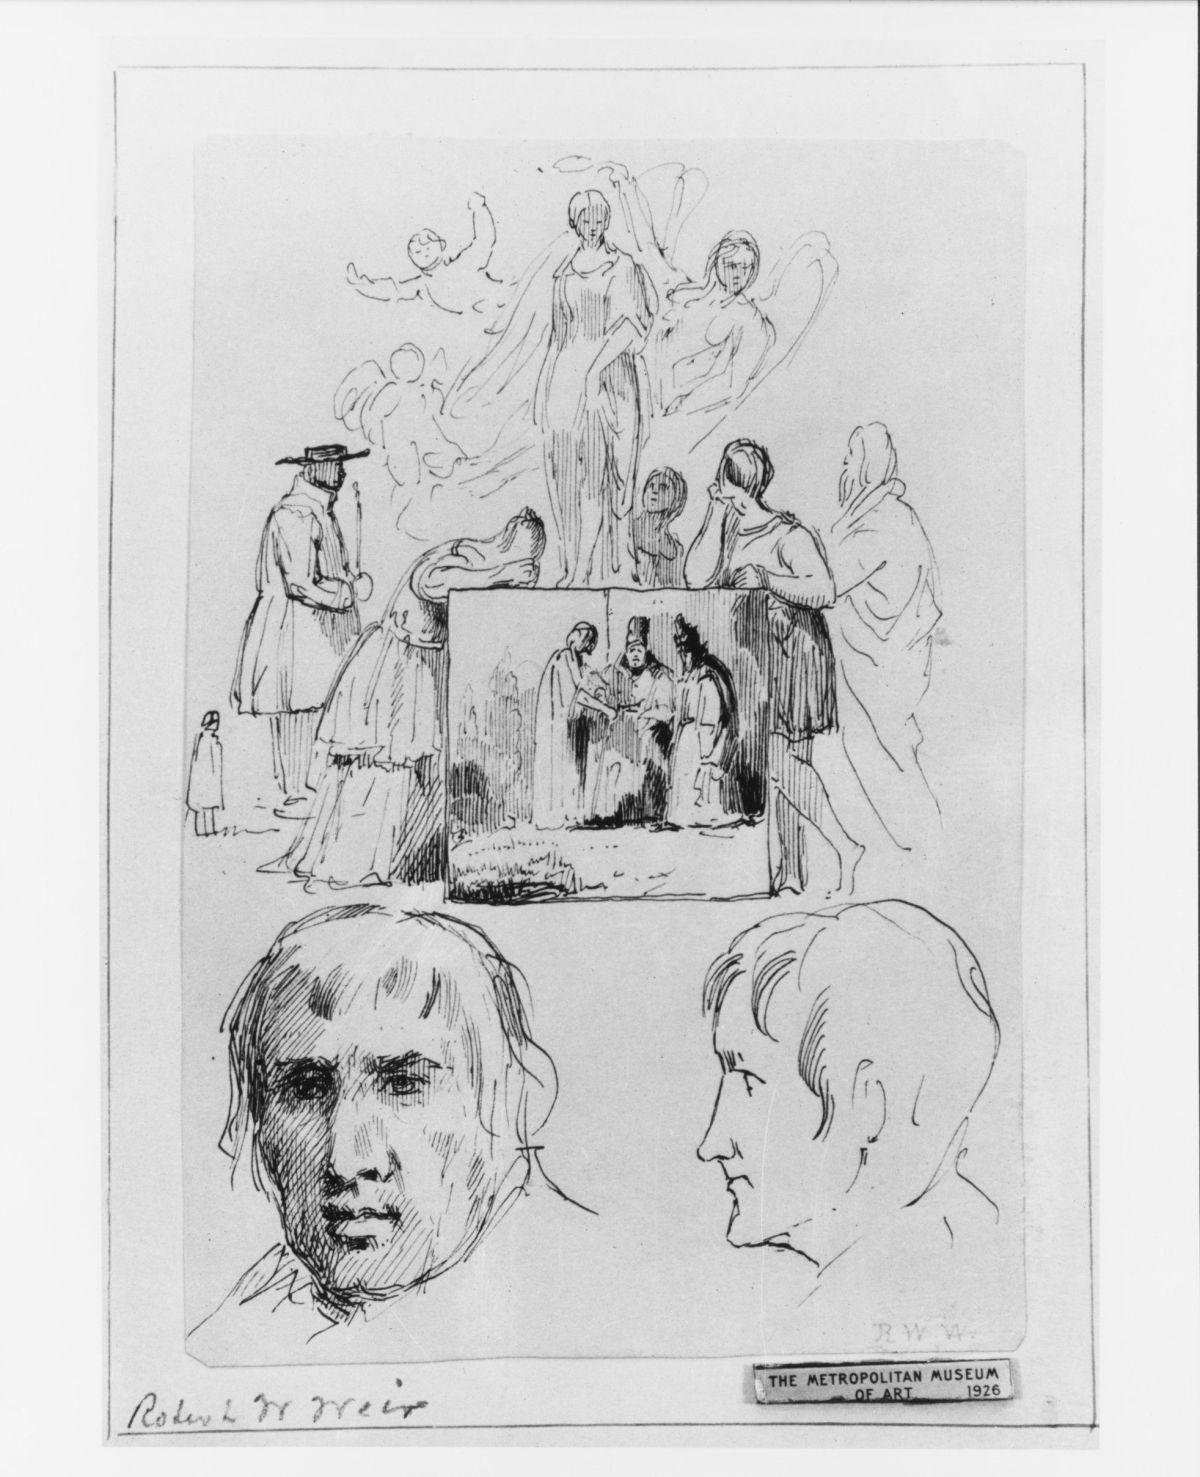 Sketches from McGuire Scrapbook by Robert Walter Weir